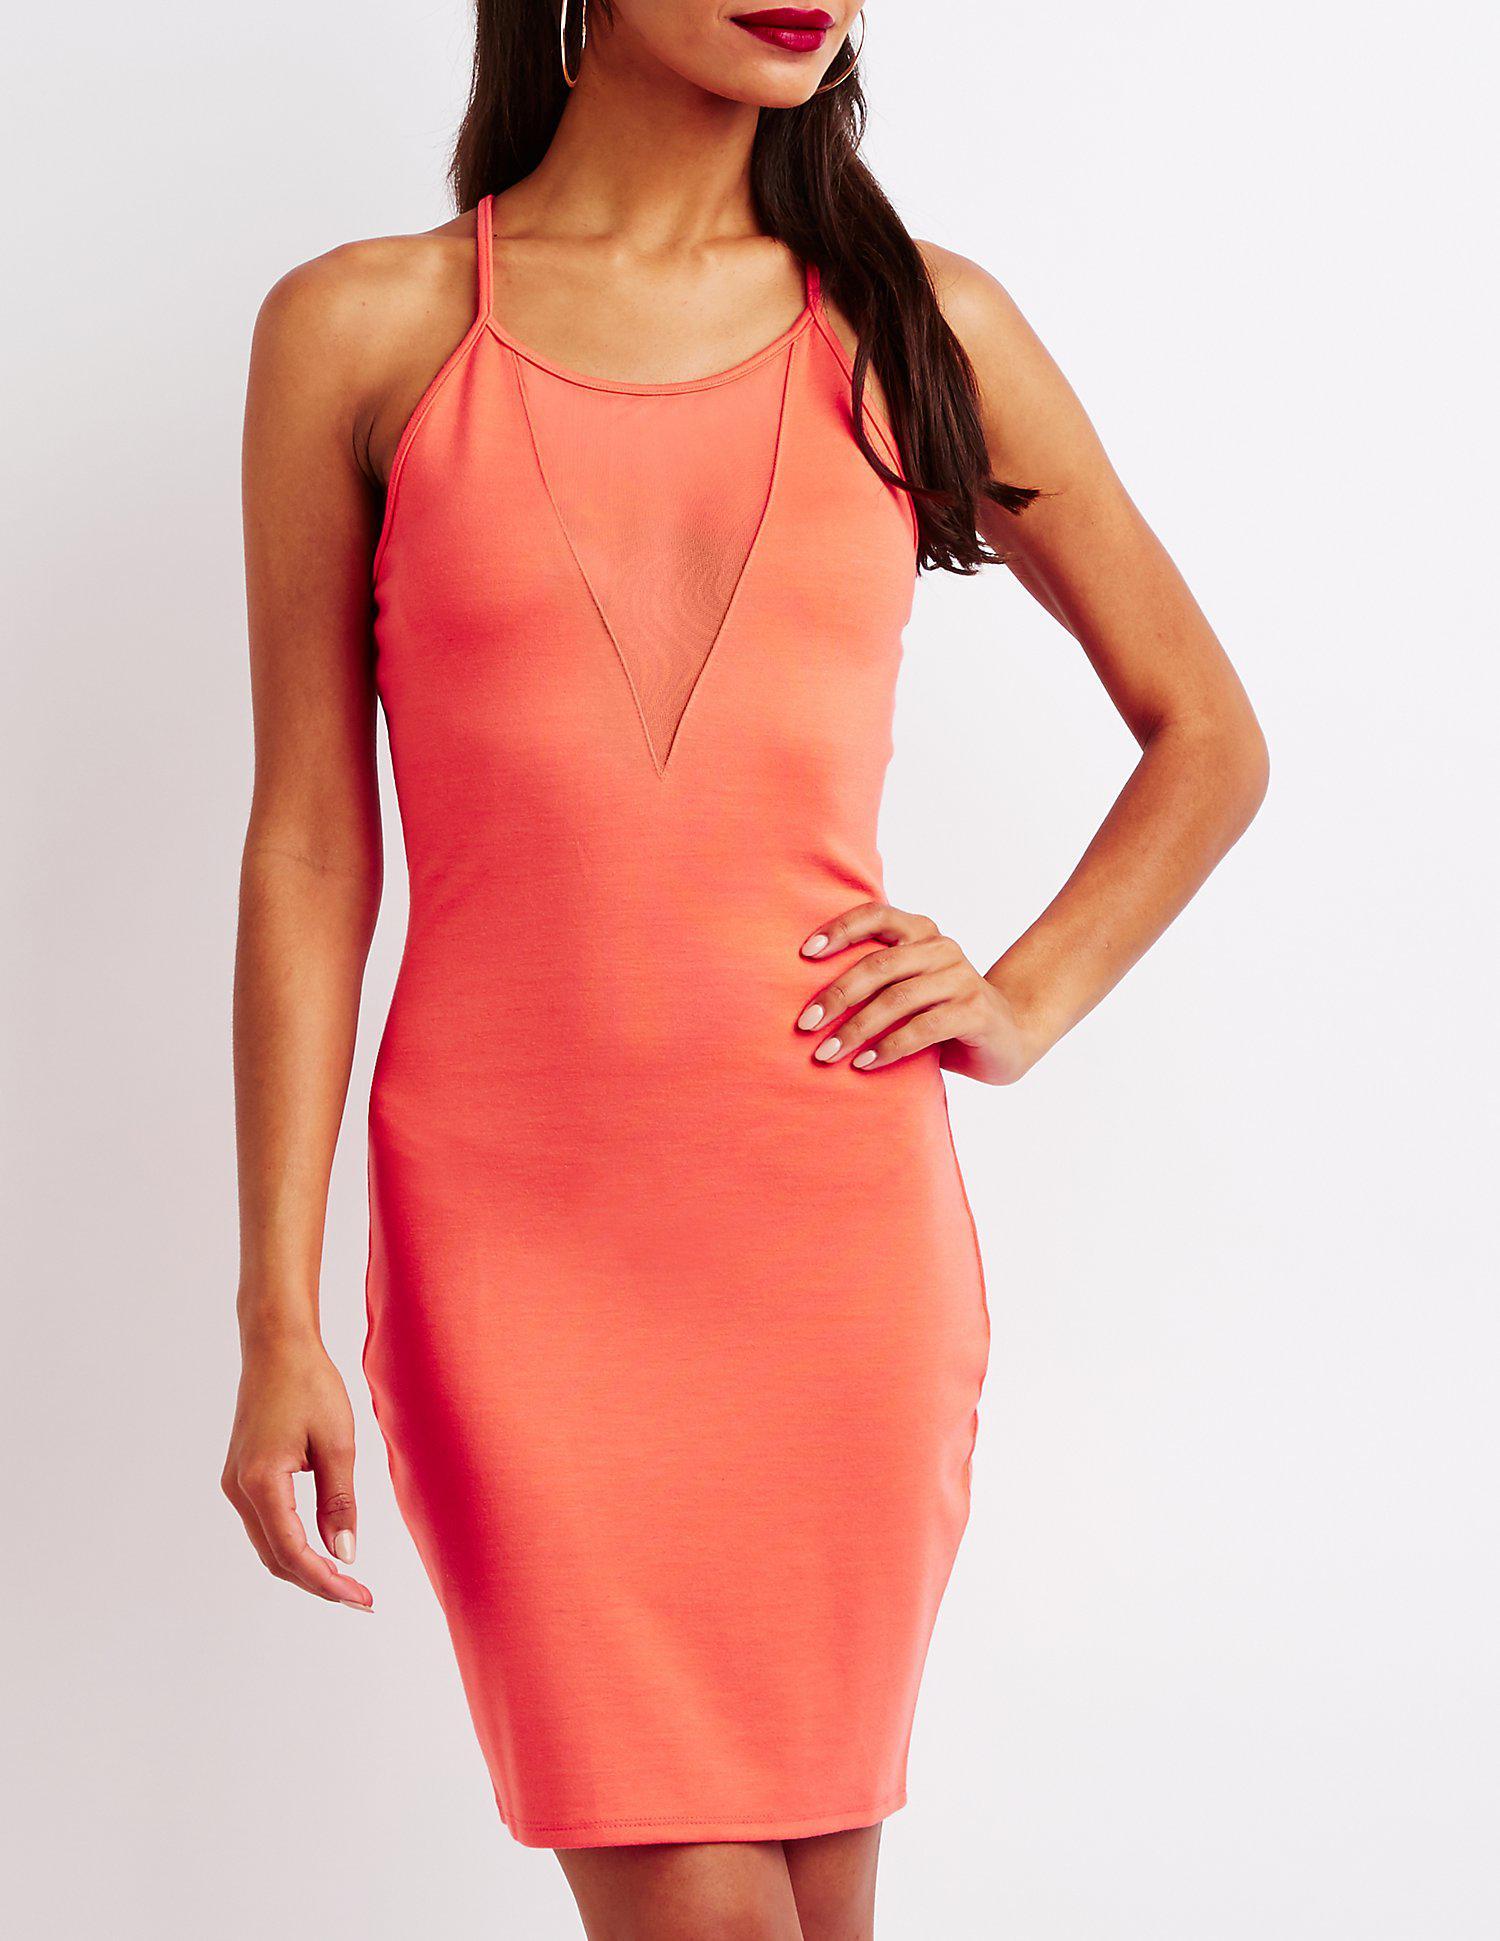 8f61ba0257c Lyst - Charlotte Russe Mesh Inset Bodycon Dress